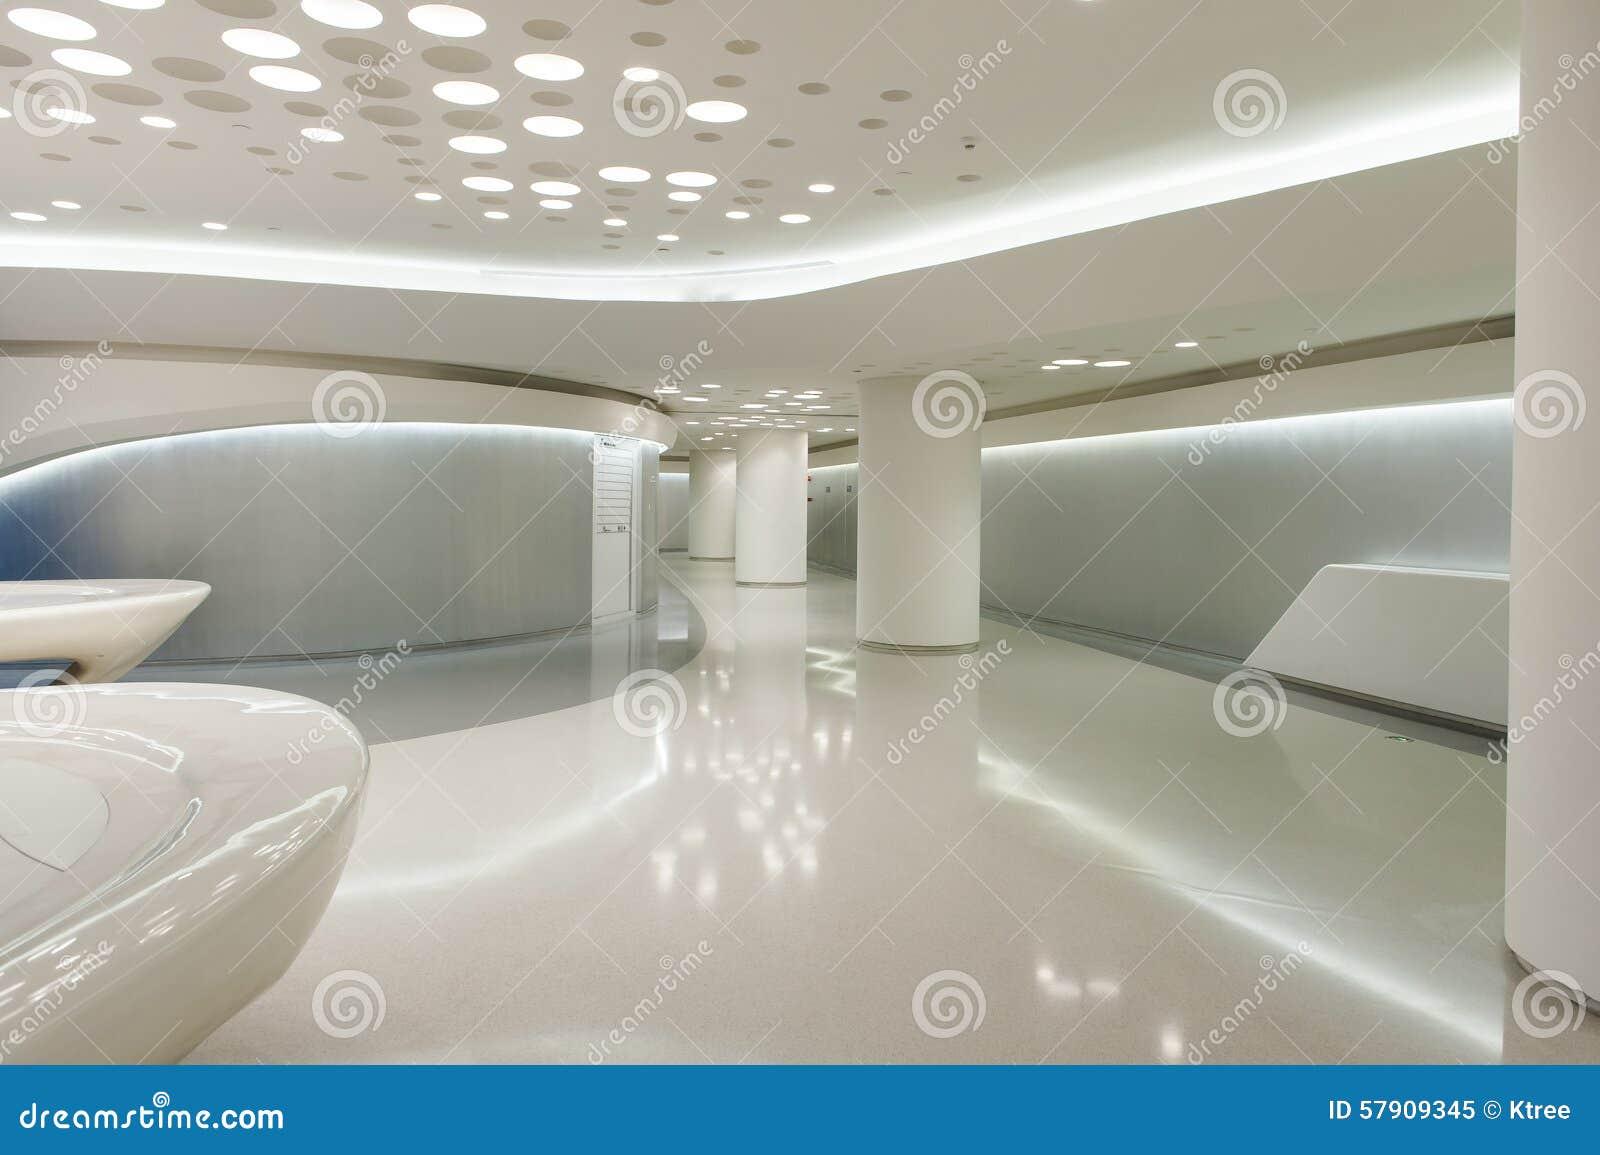 Stylish Modern Office Stock Photo - Image: 57909345